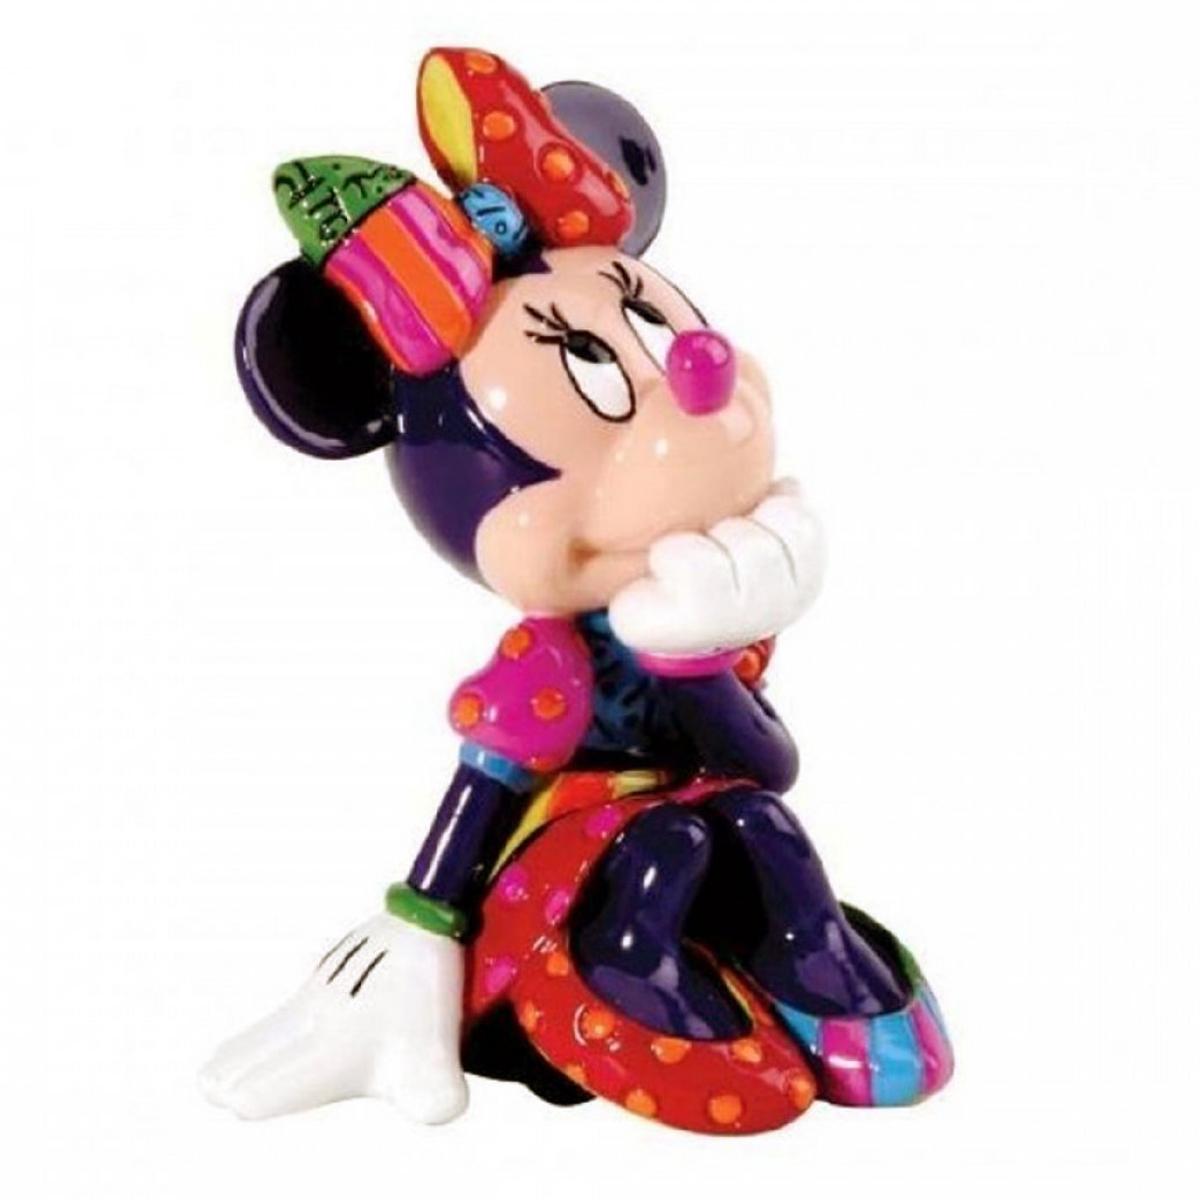 Figurine créateur \'Minnie\' multicolore (Britto) - 70x50 mm - [A1971]